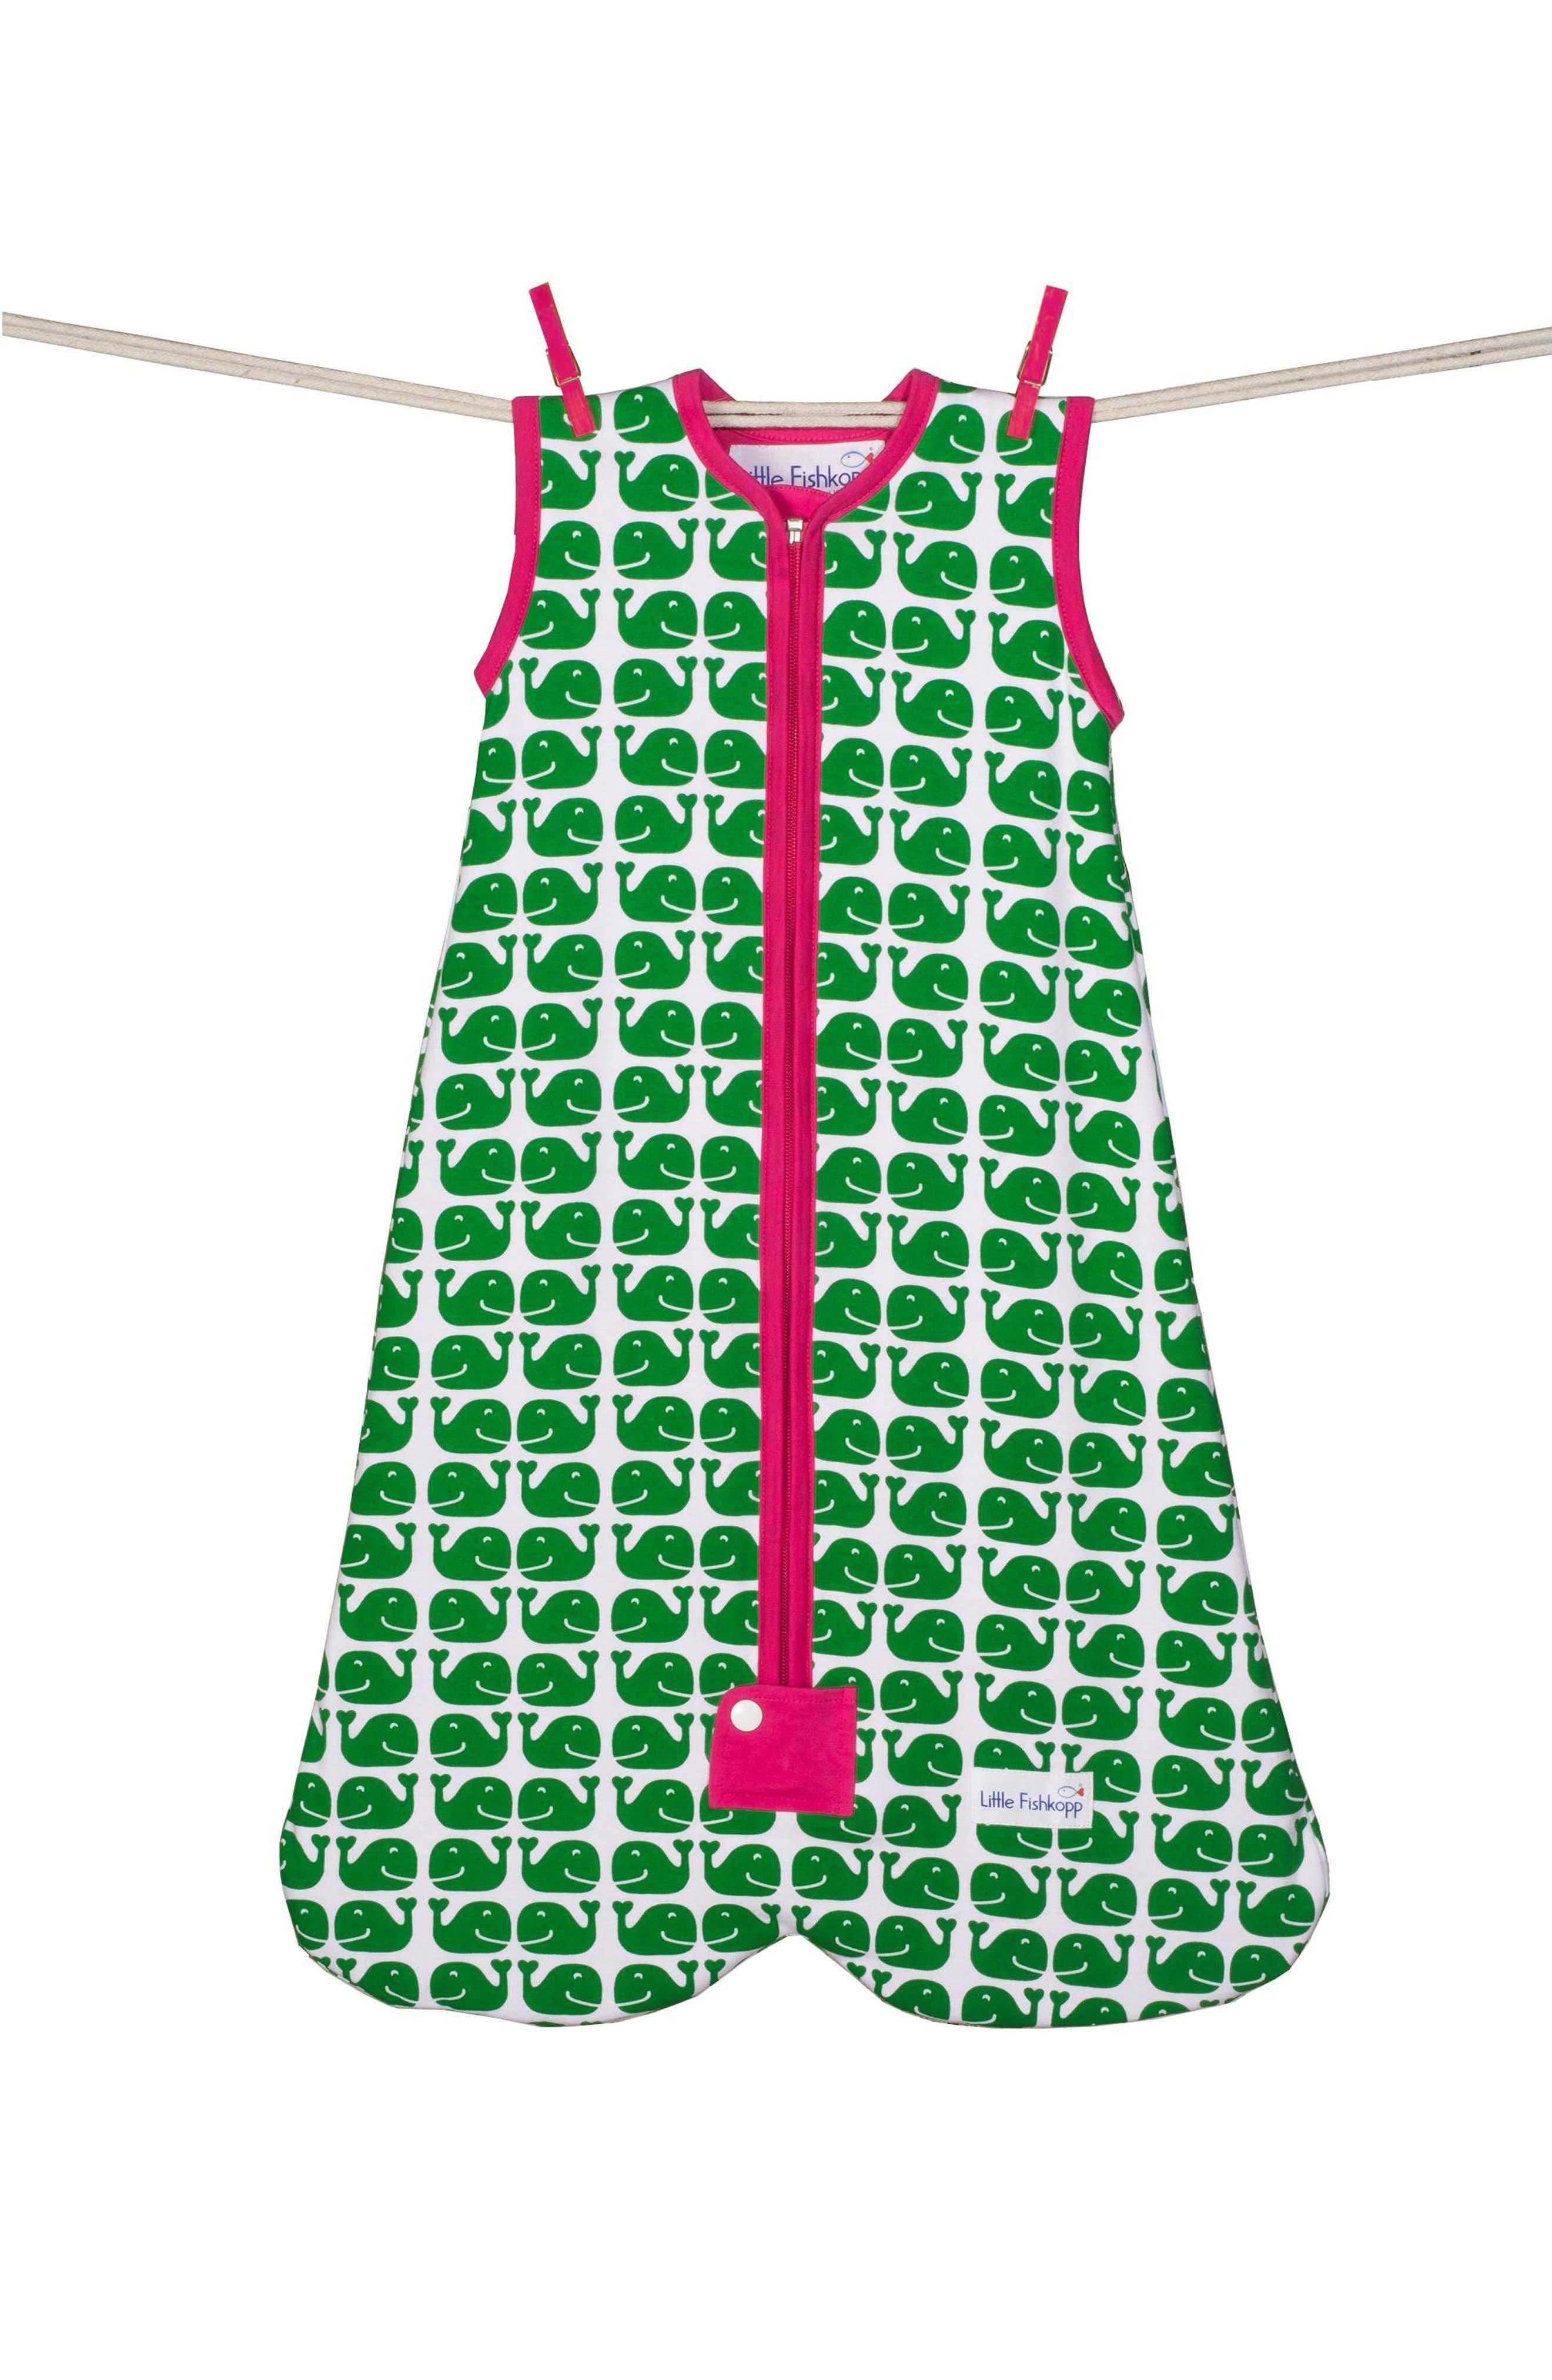 Little Fishkopp Whales Organic Cotton Wearable Blanket (Baby)